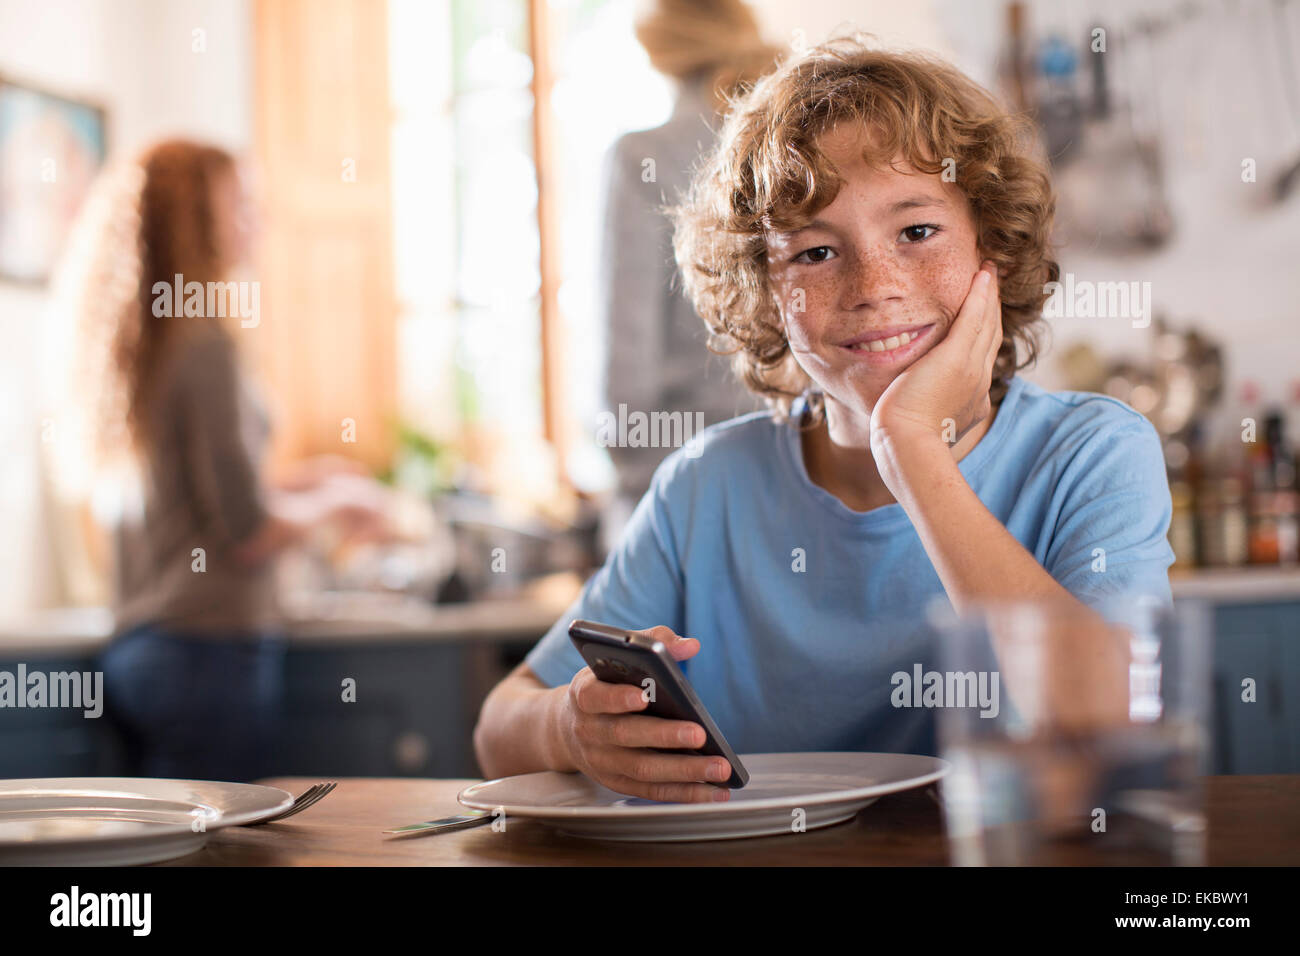 Teenager halten Smartphone am Esstisch Stockbild